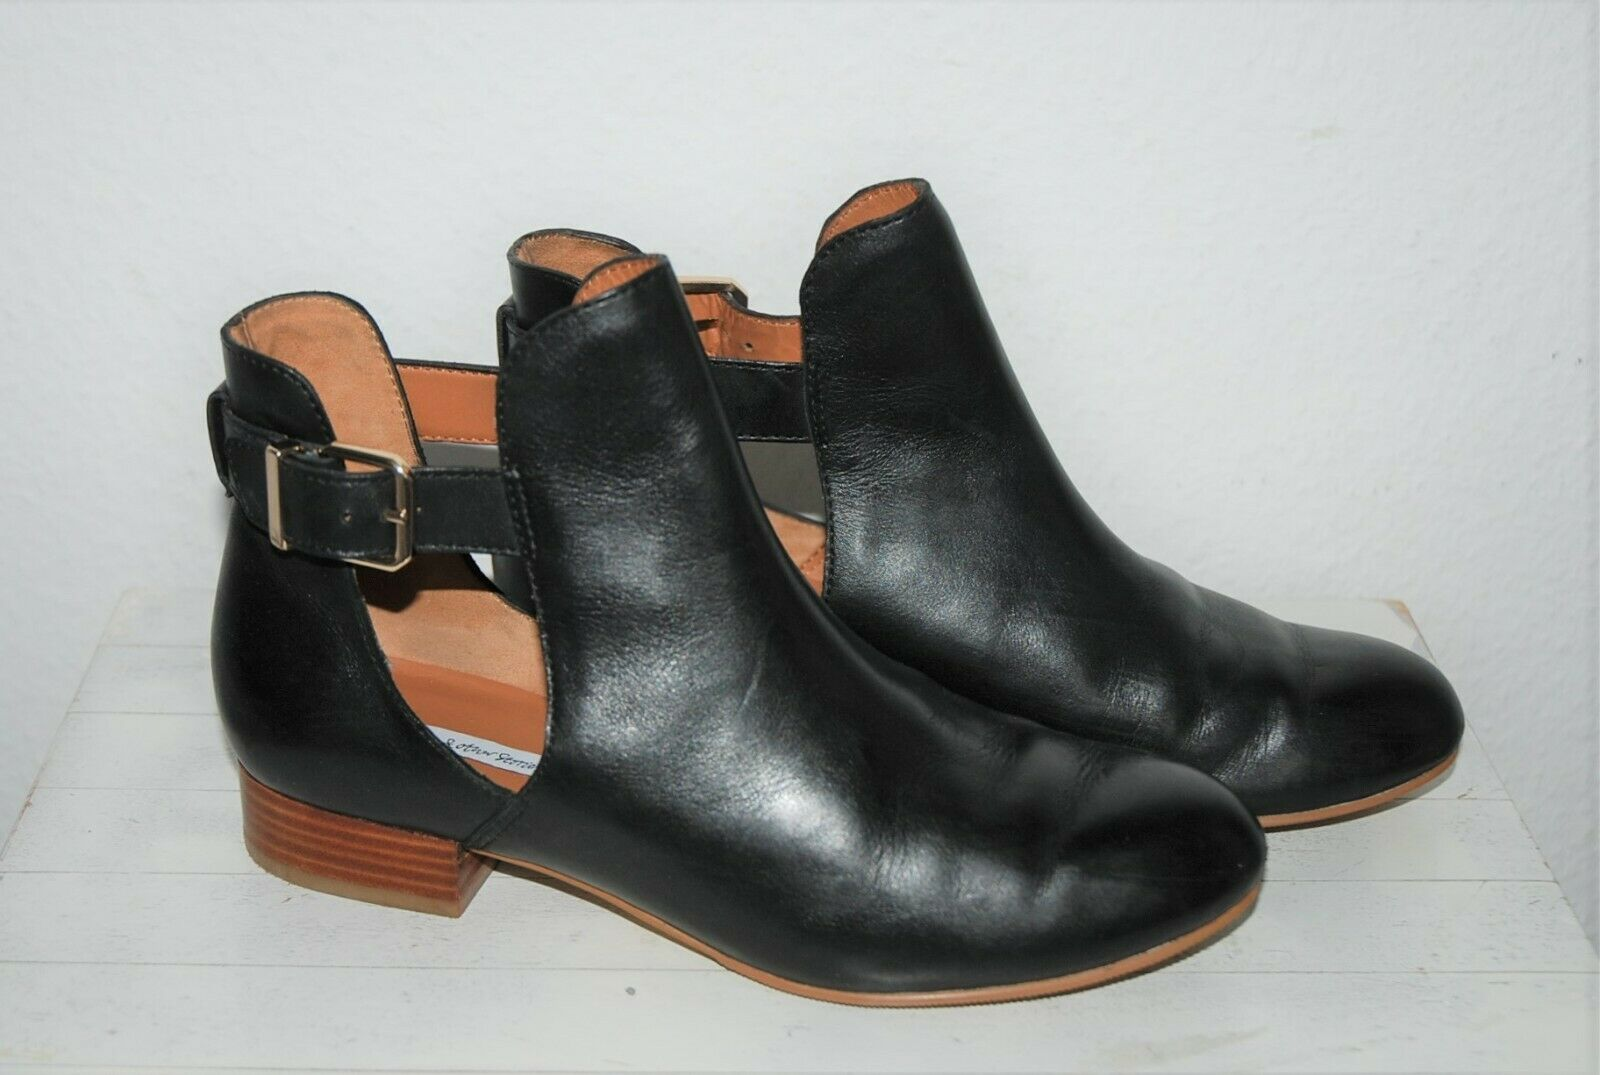 & OTHER STORIES  Halbschuhe Ankle Stiefel mit Cut Outs  Schwarz  Leder  37